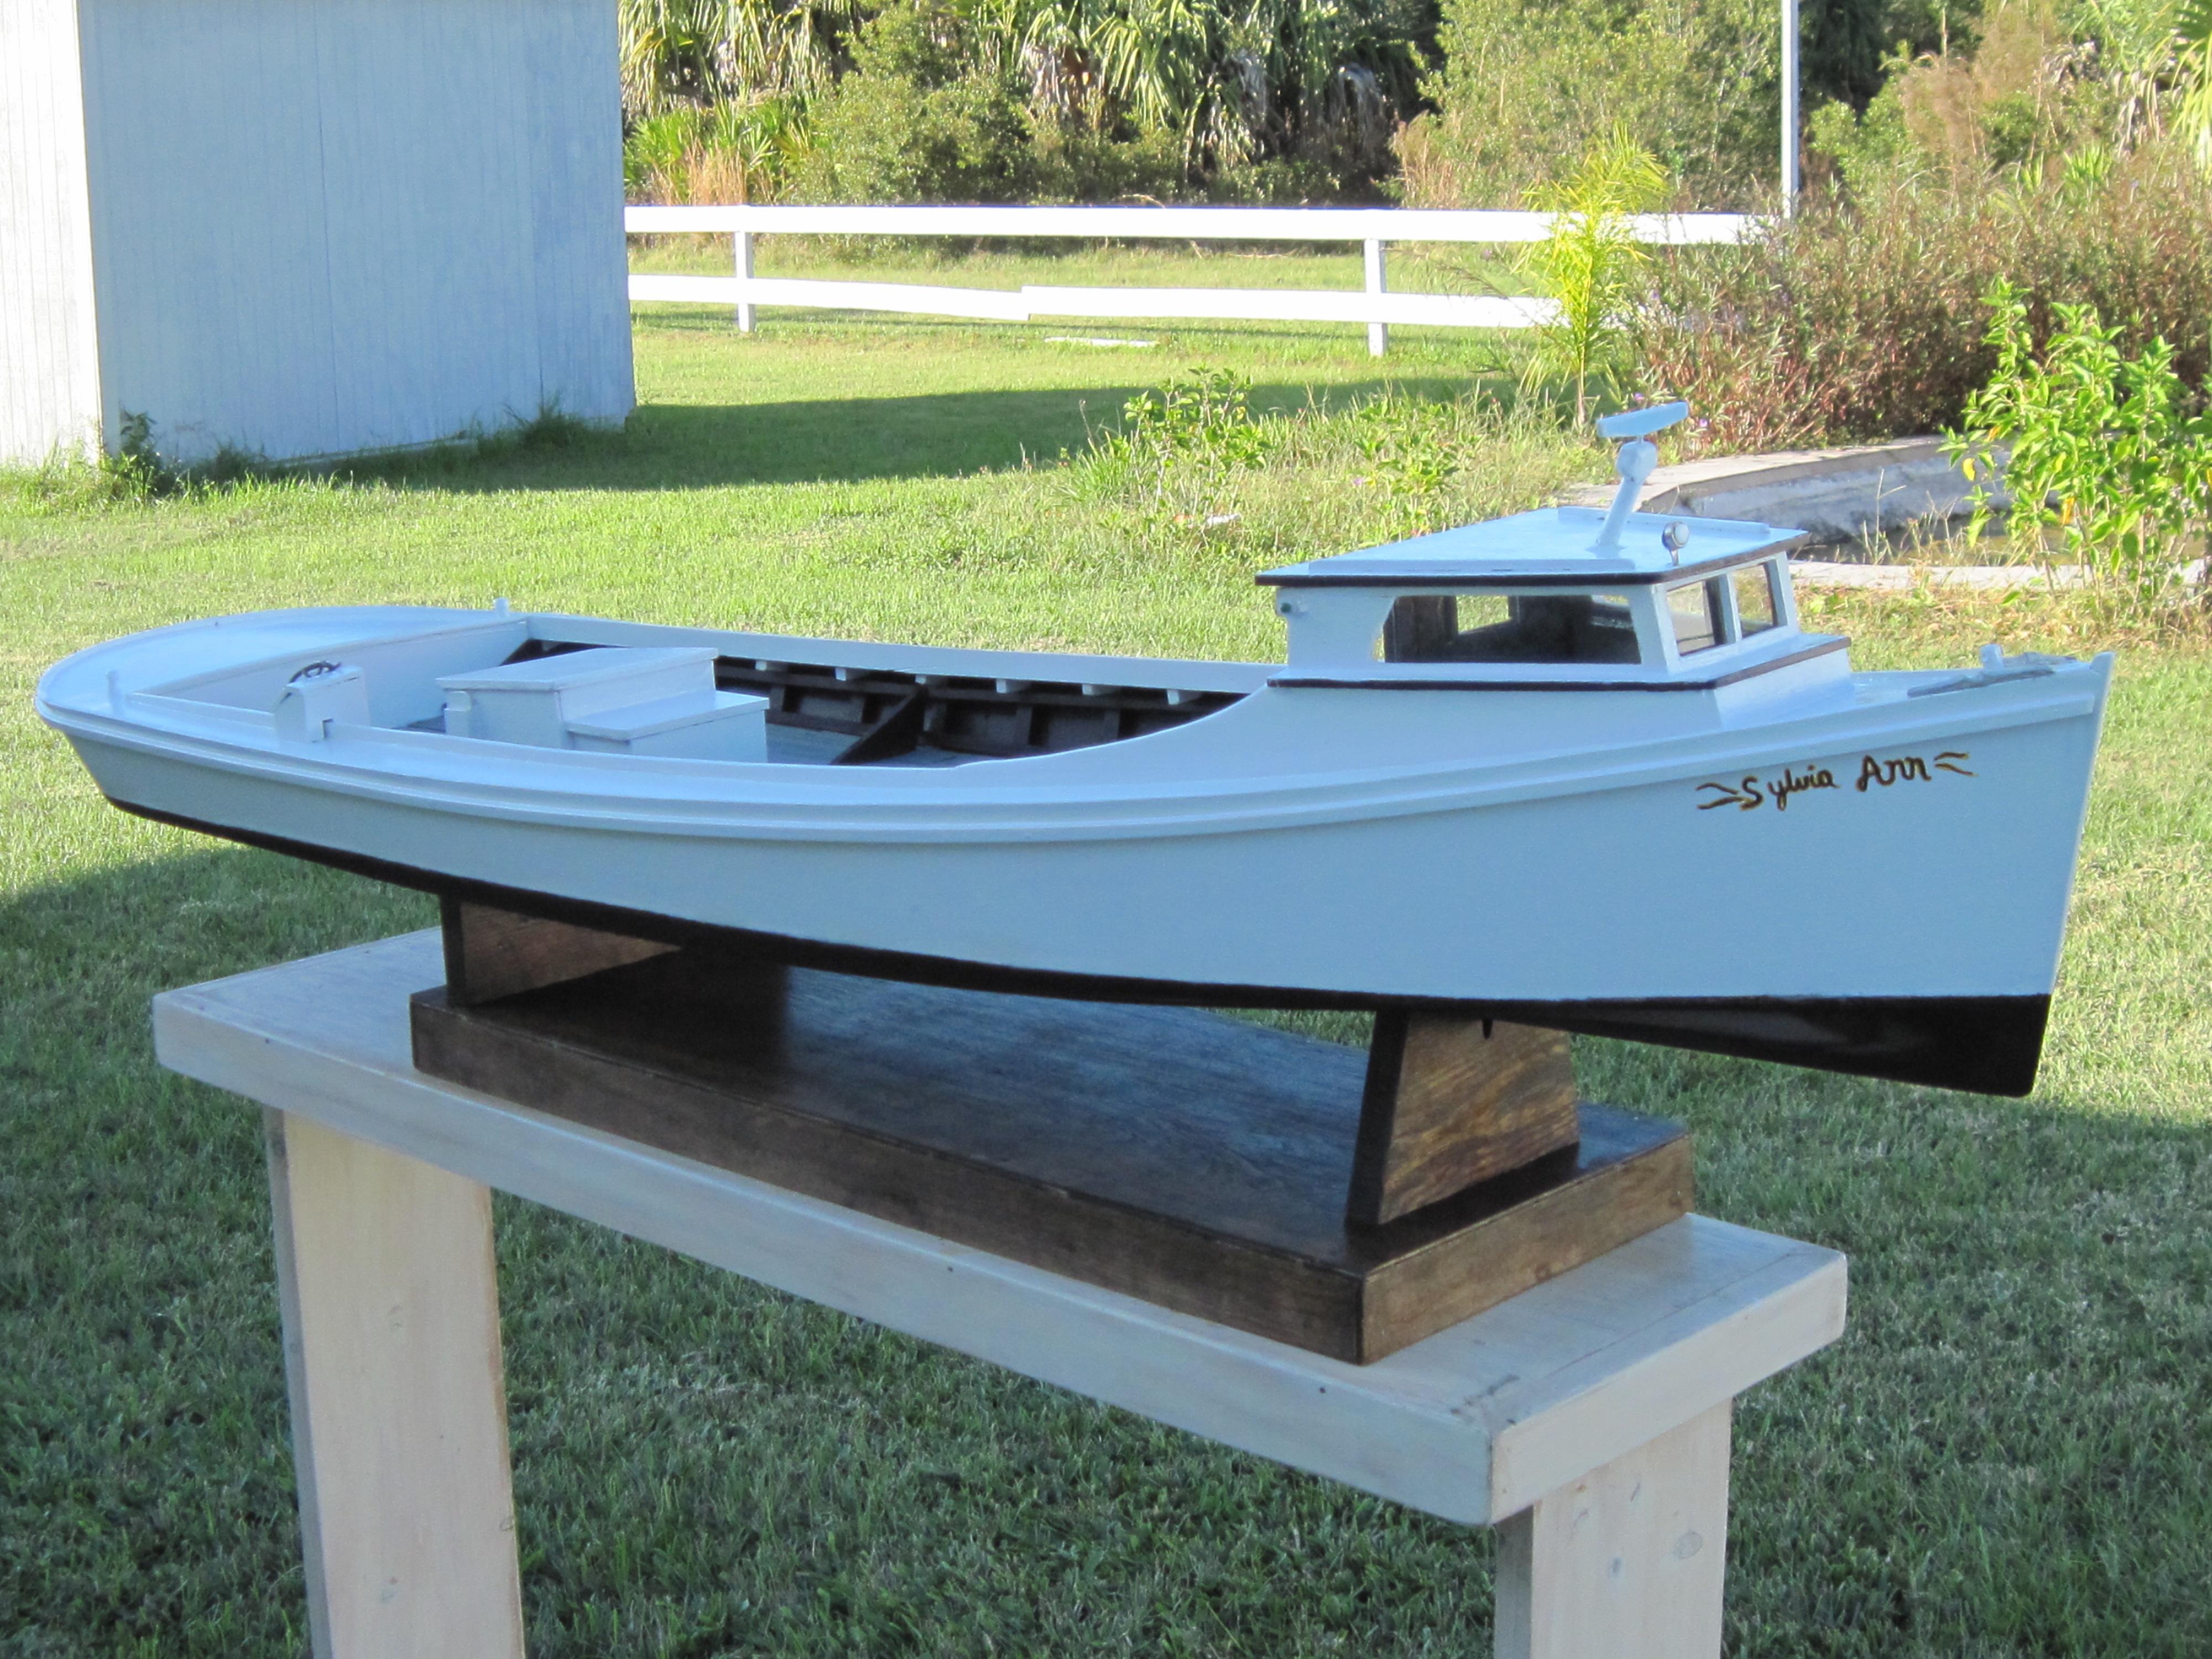 Chesapeake Bay model work boats   John Marsdon Watkins   Foundmyself